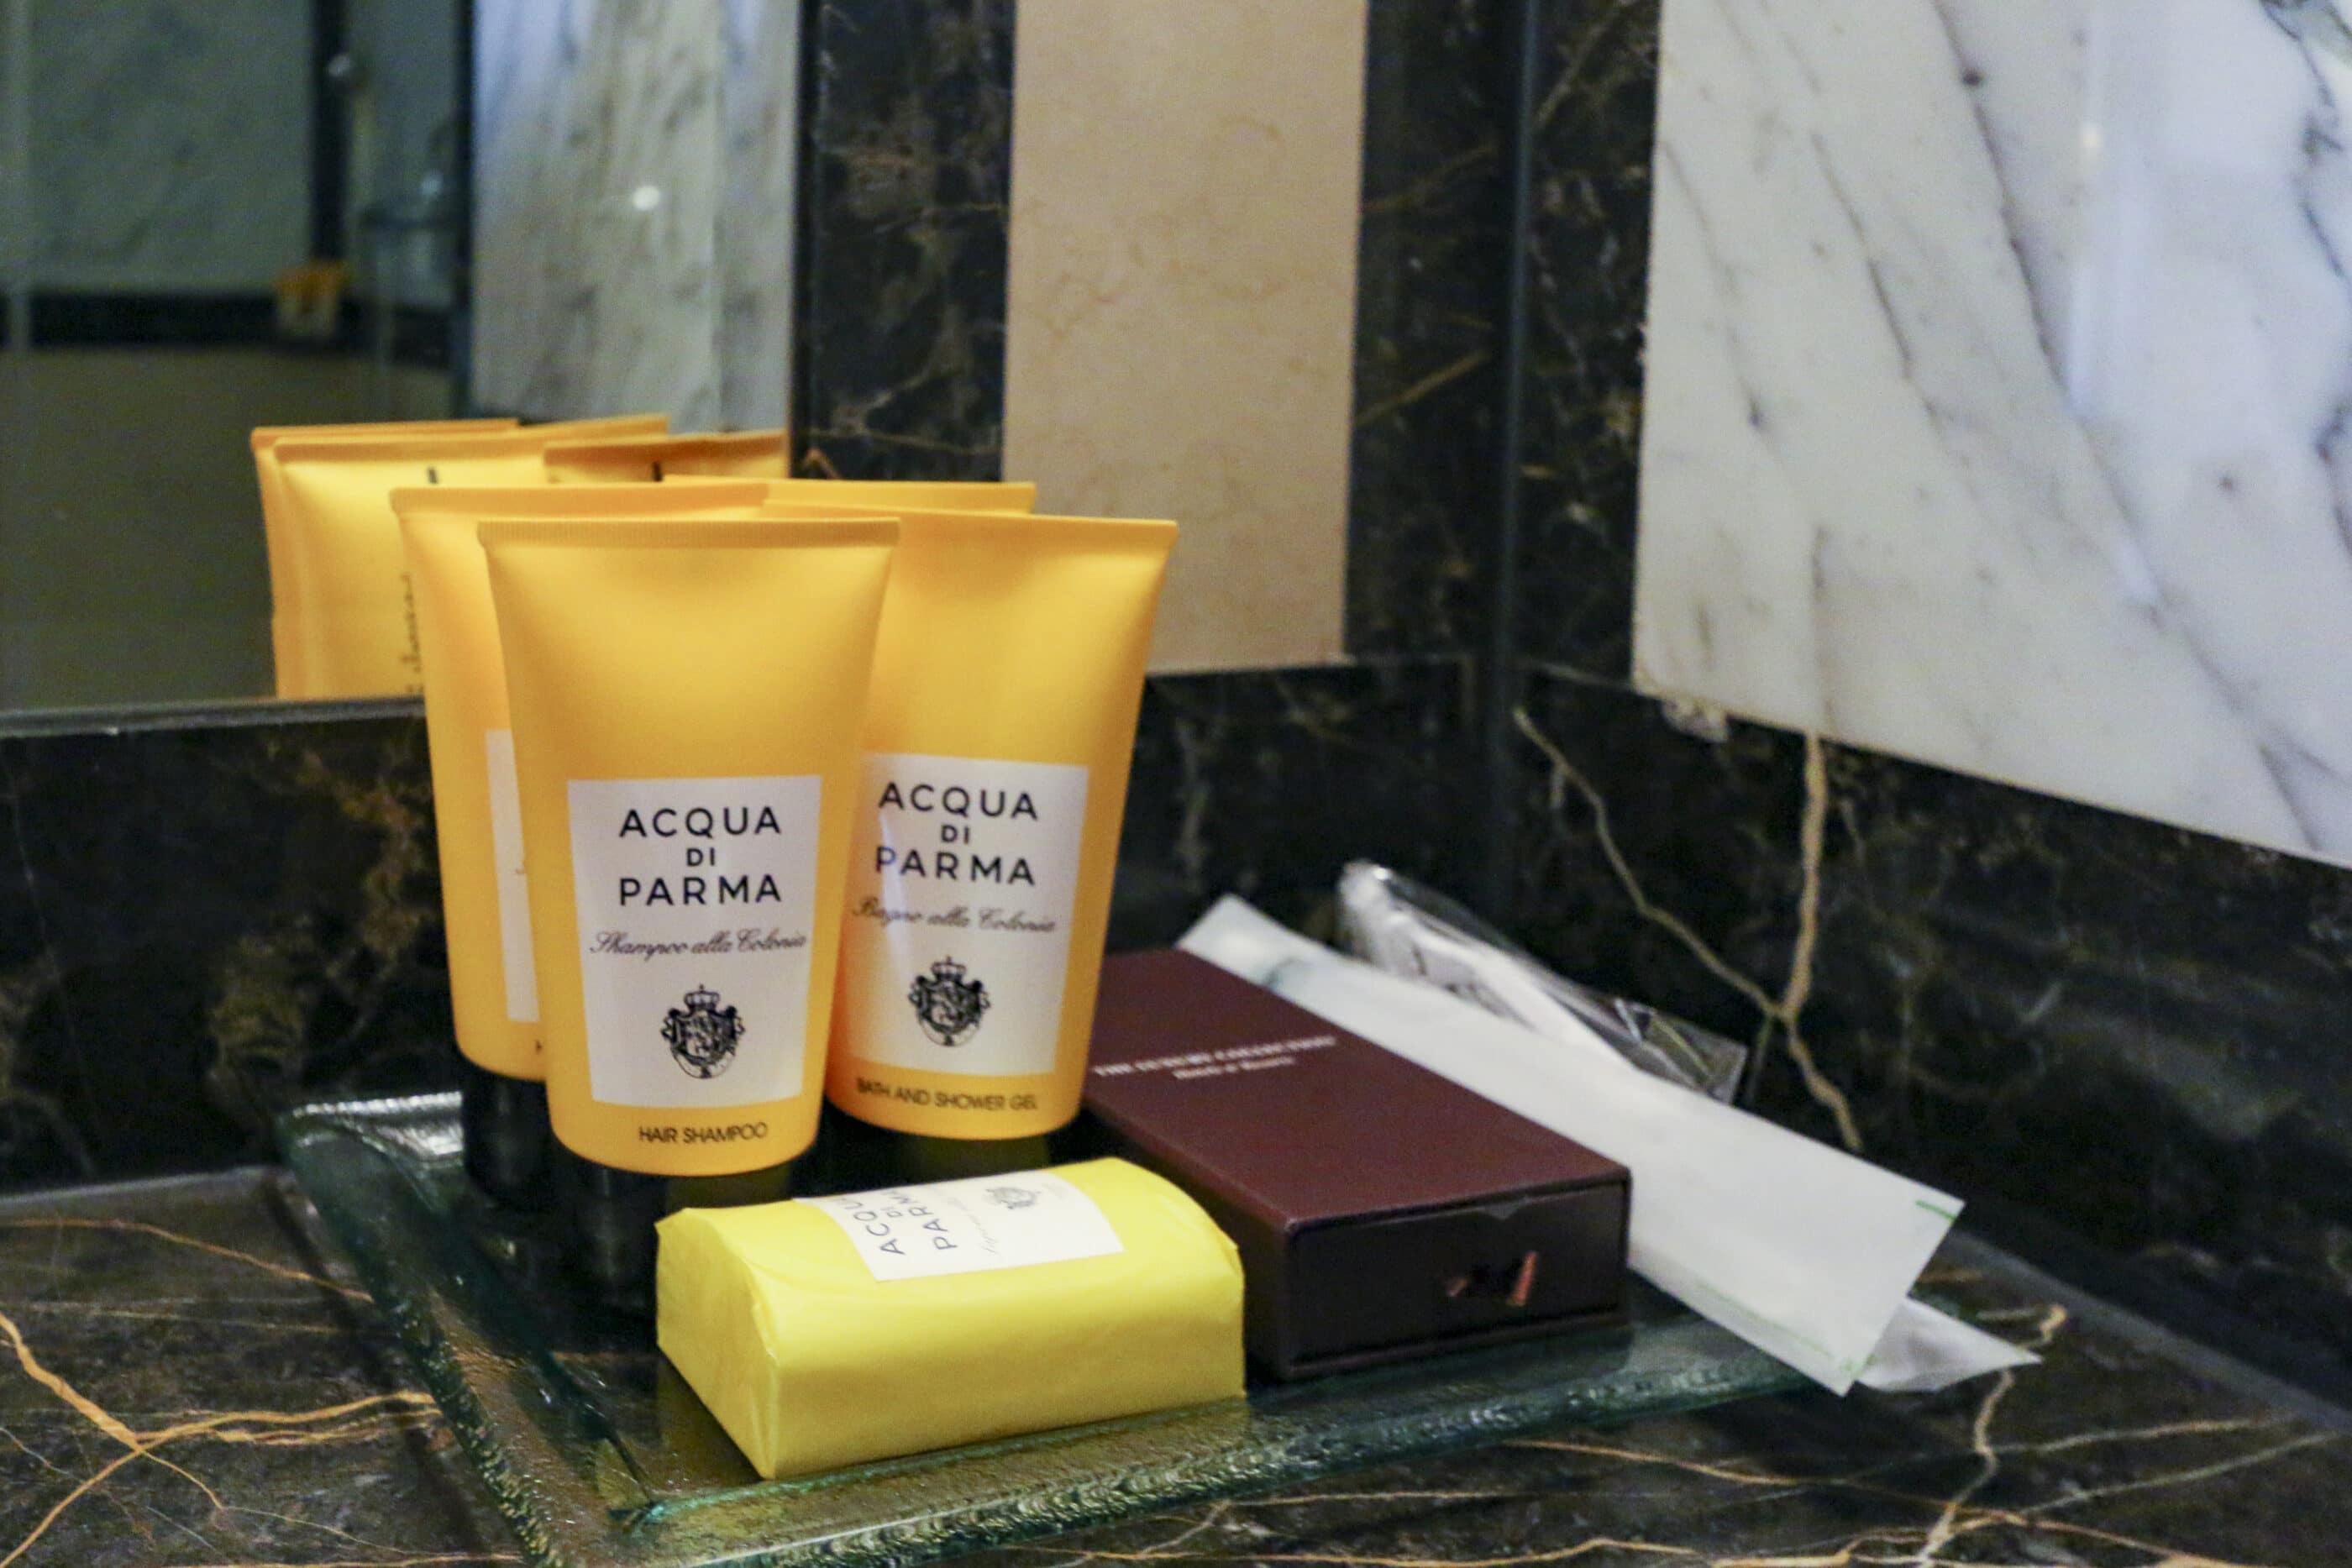 Full size Acqua di Parma bath amenities in our Deluxe Suite at Hotel Grande Bretagne Athens.